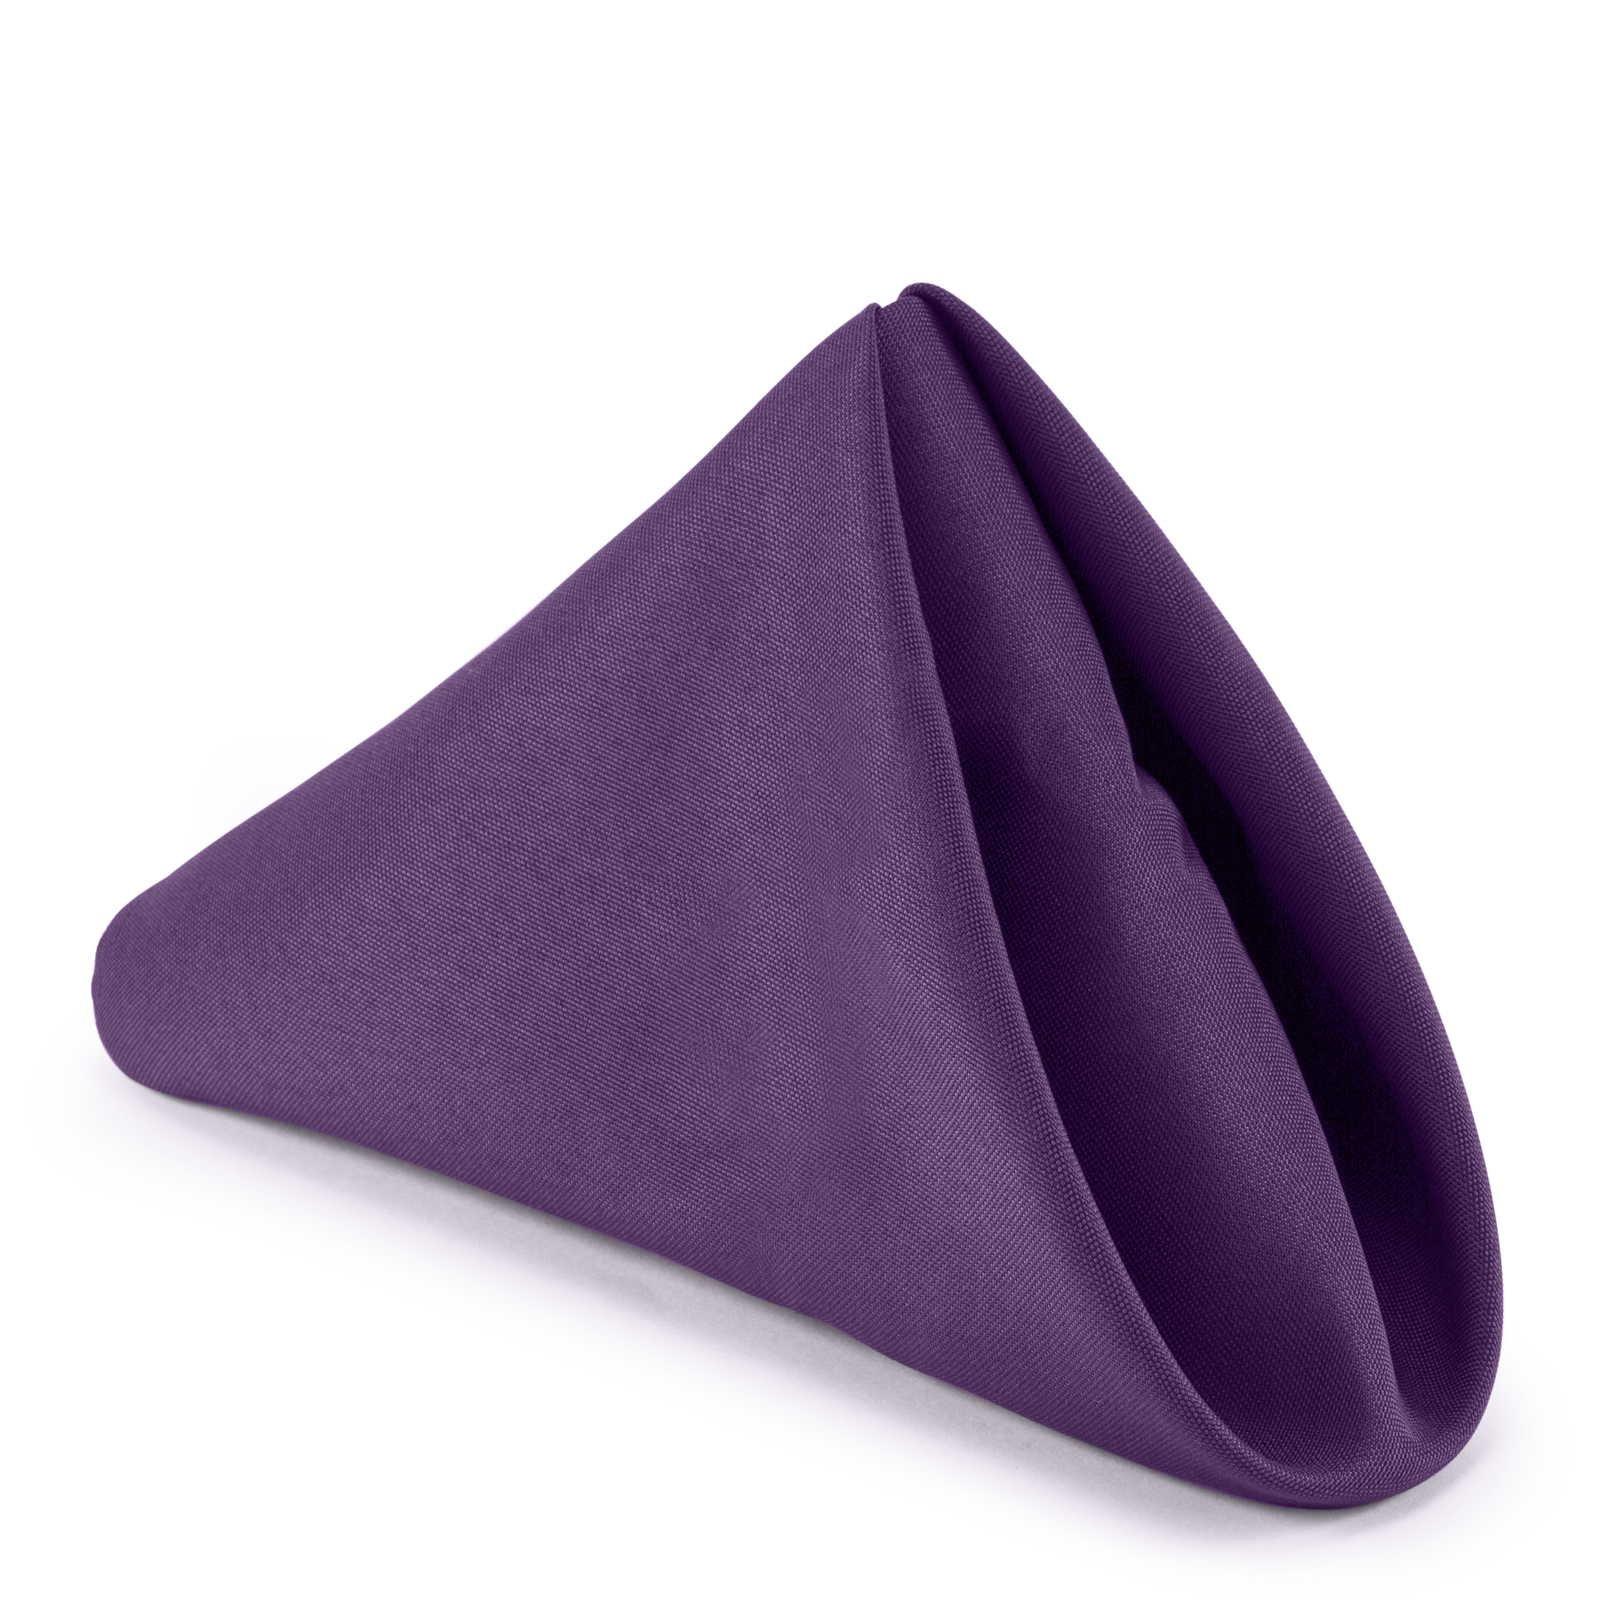 Lann's Linens - 1 Dozen 20'' Oversized Cloth Dinner Table Napkins - Machine Washable Restaurant/Wedding/Hotel Quality Polyester Fabric - Purple